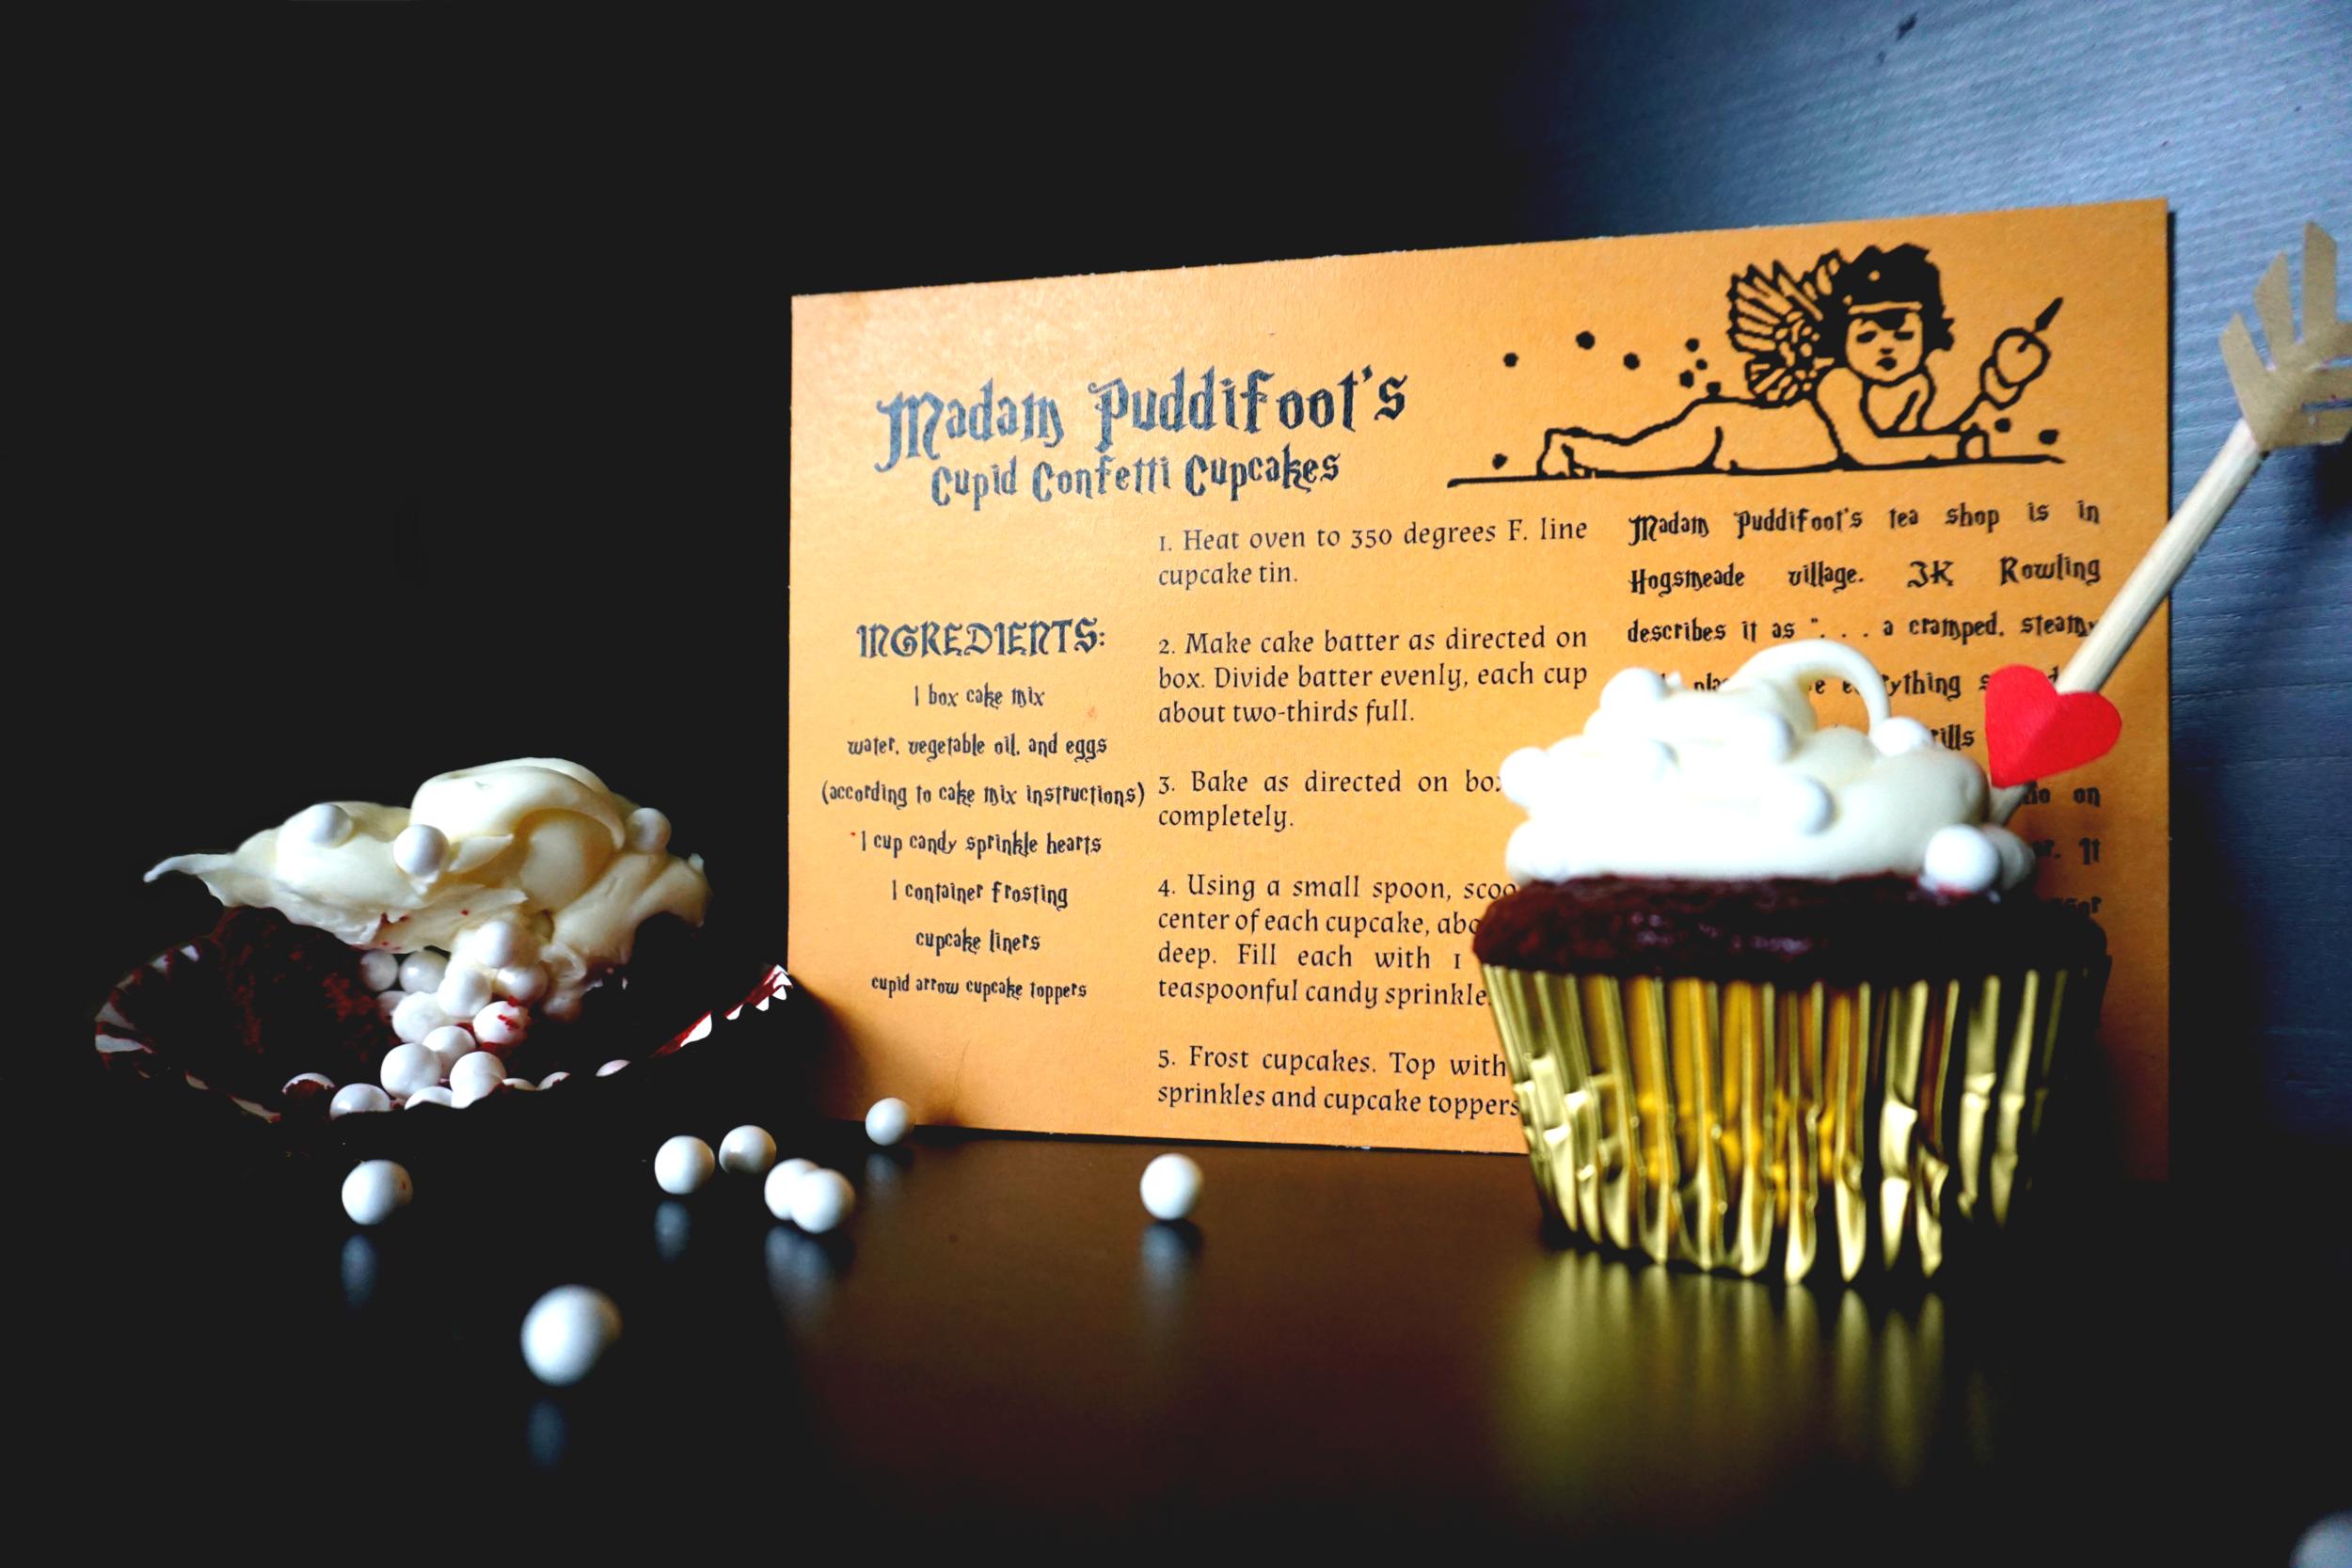 Madam Puddifoot's Cupid Cupcakes